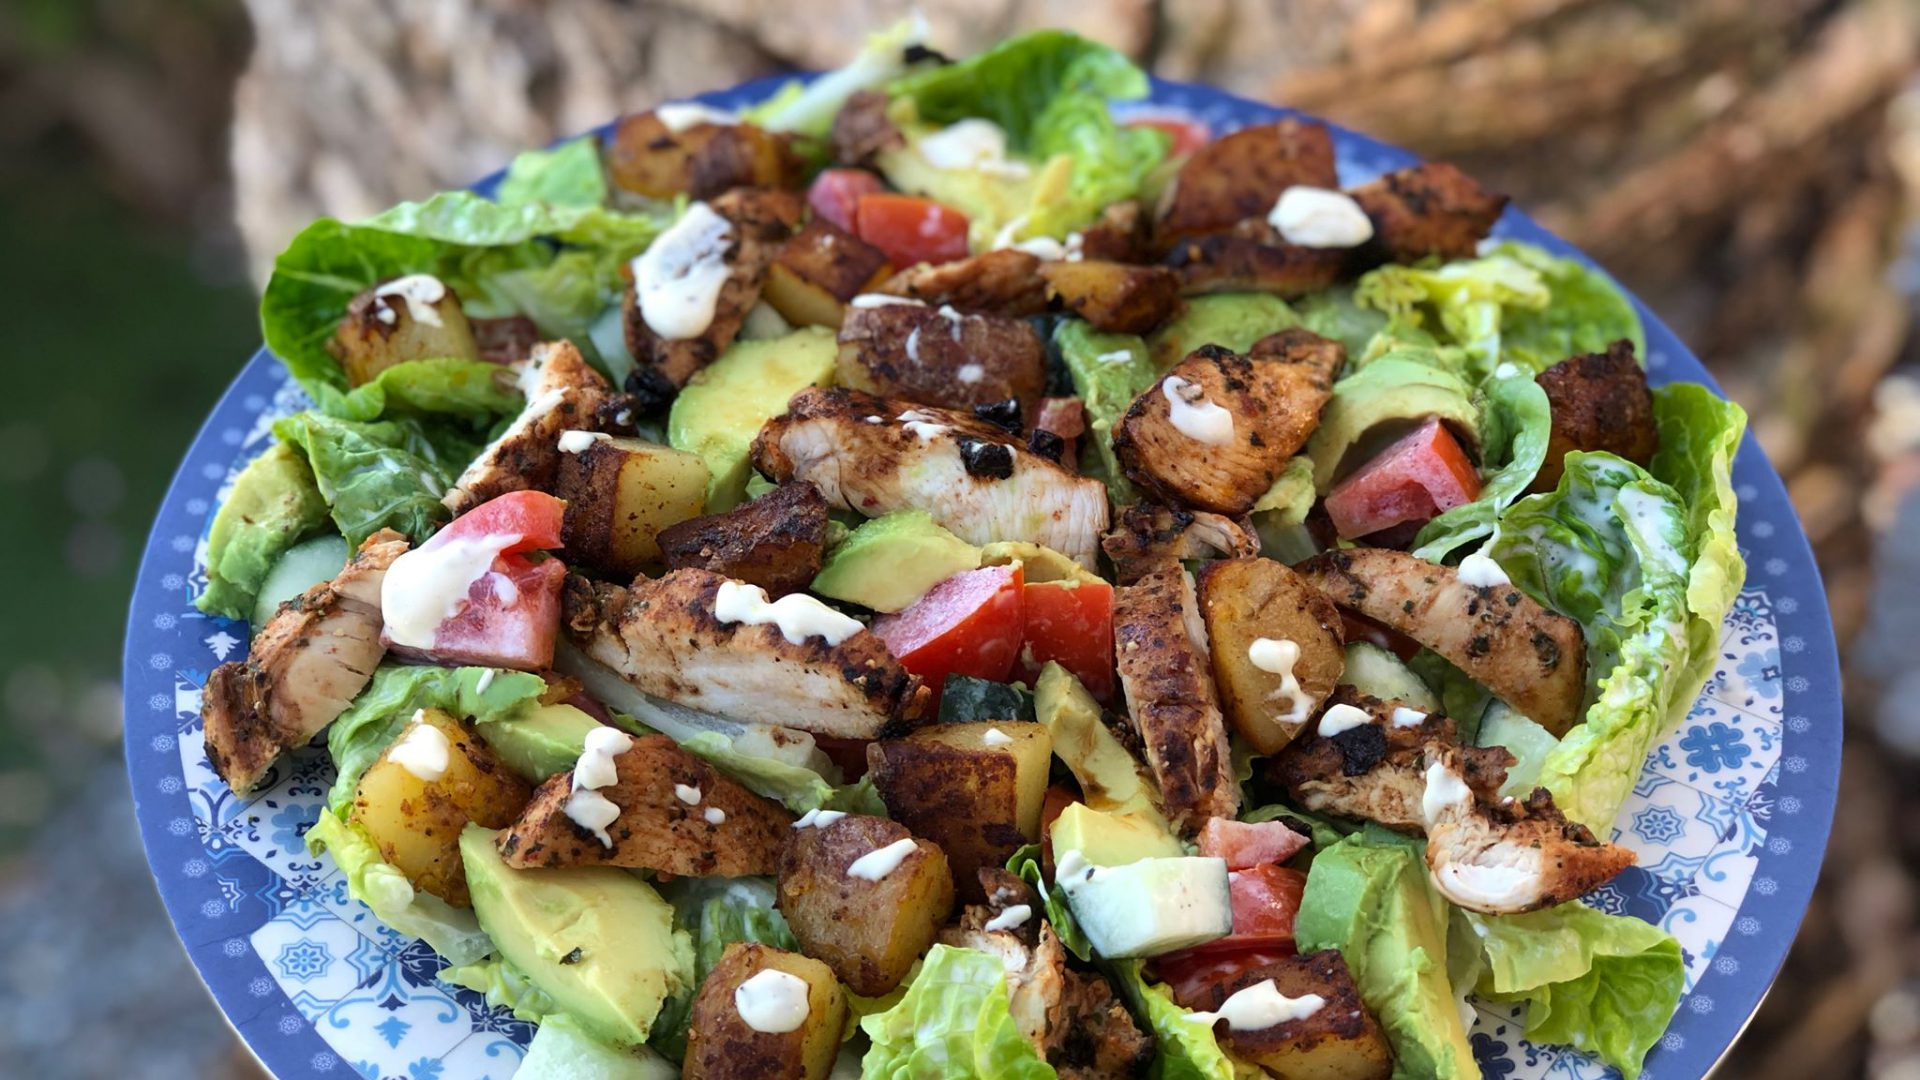 zomer salade met kruidige kip